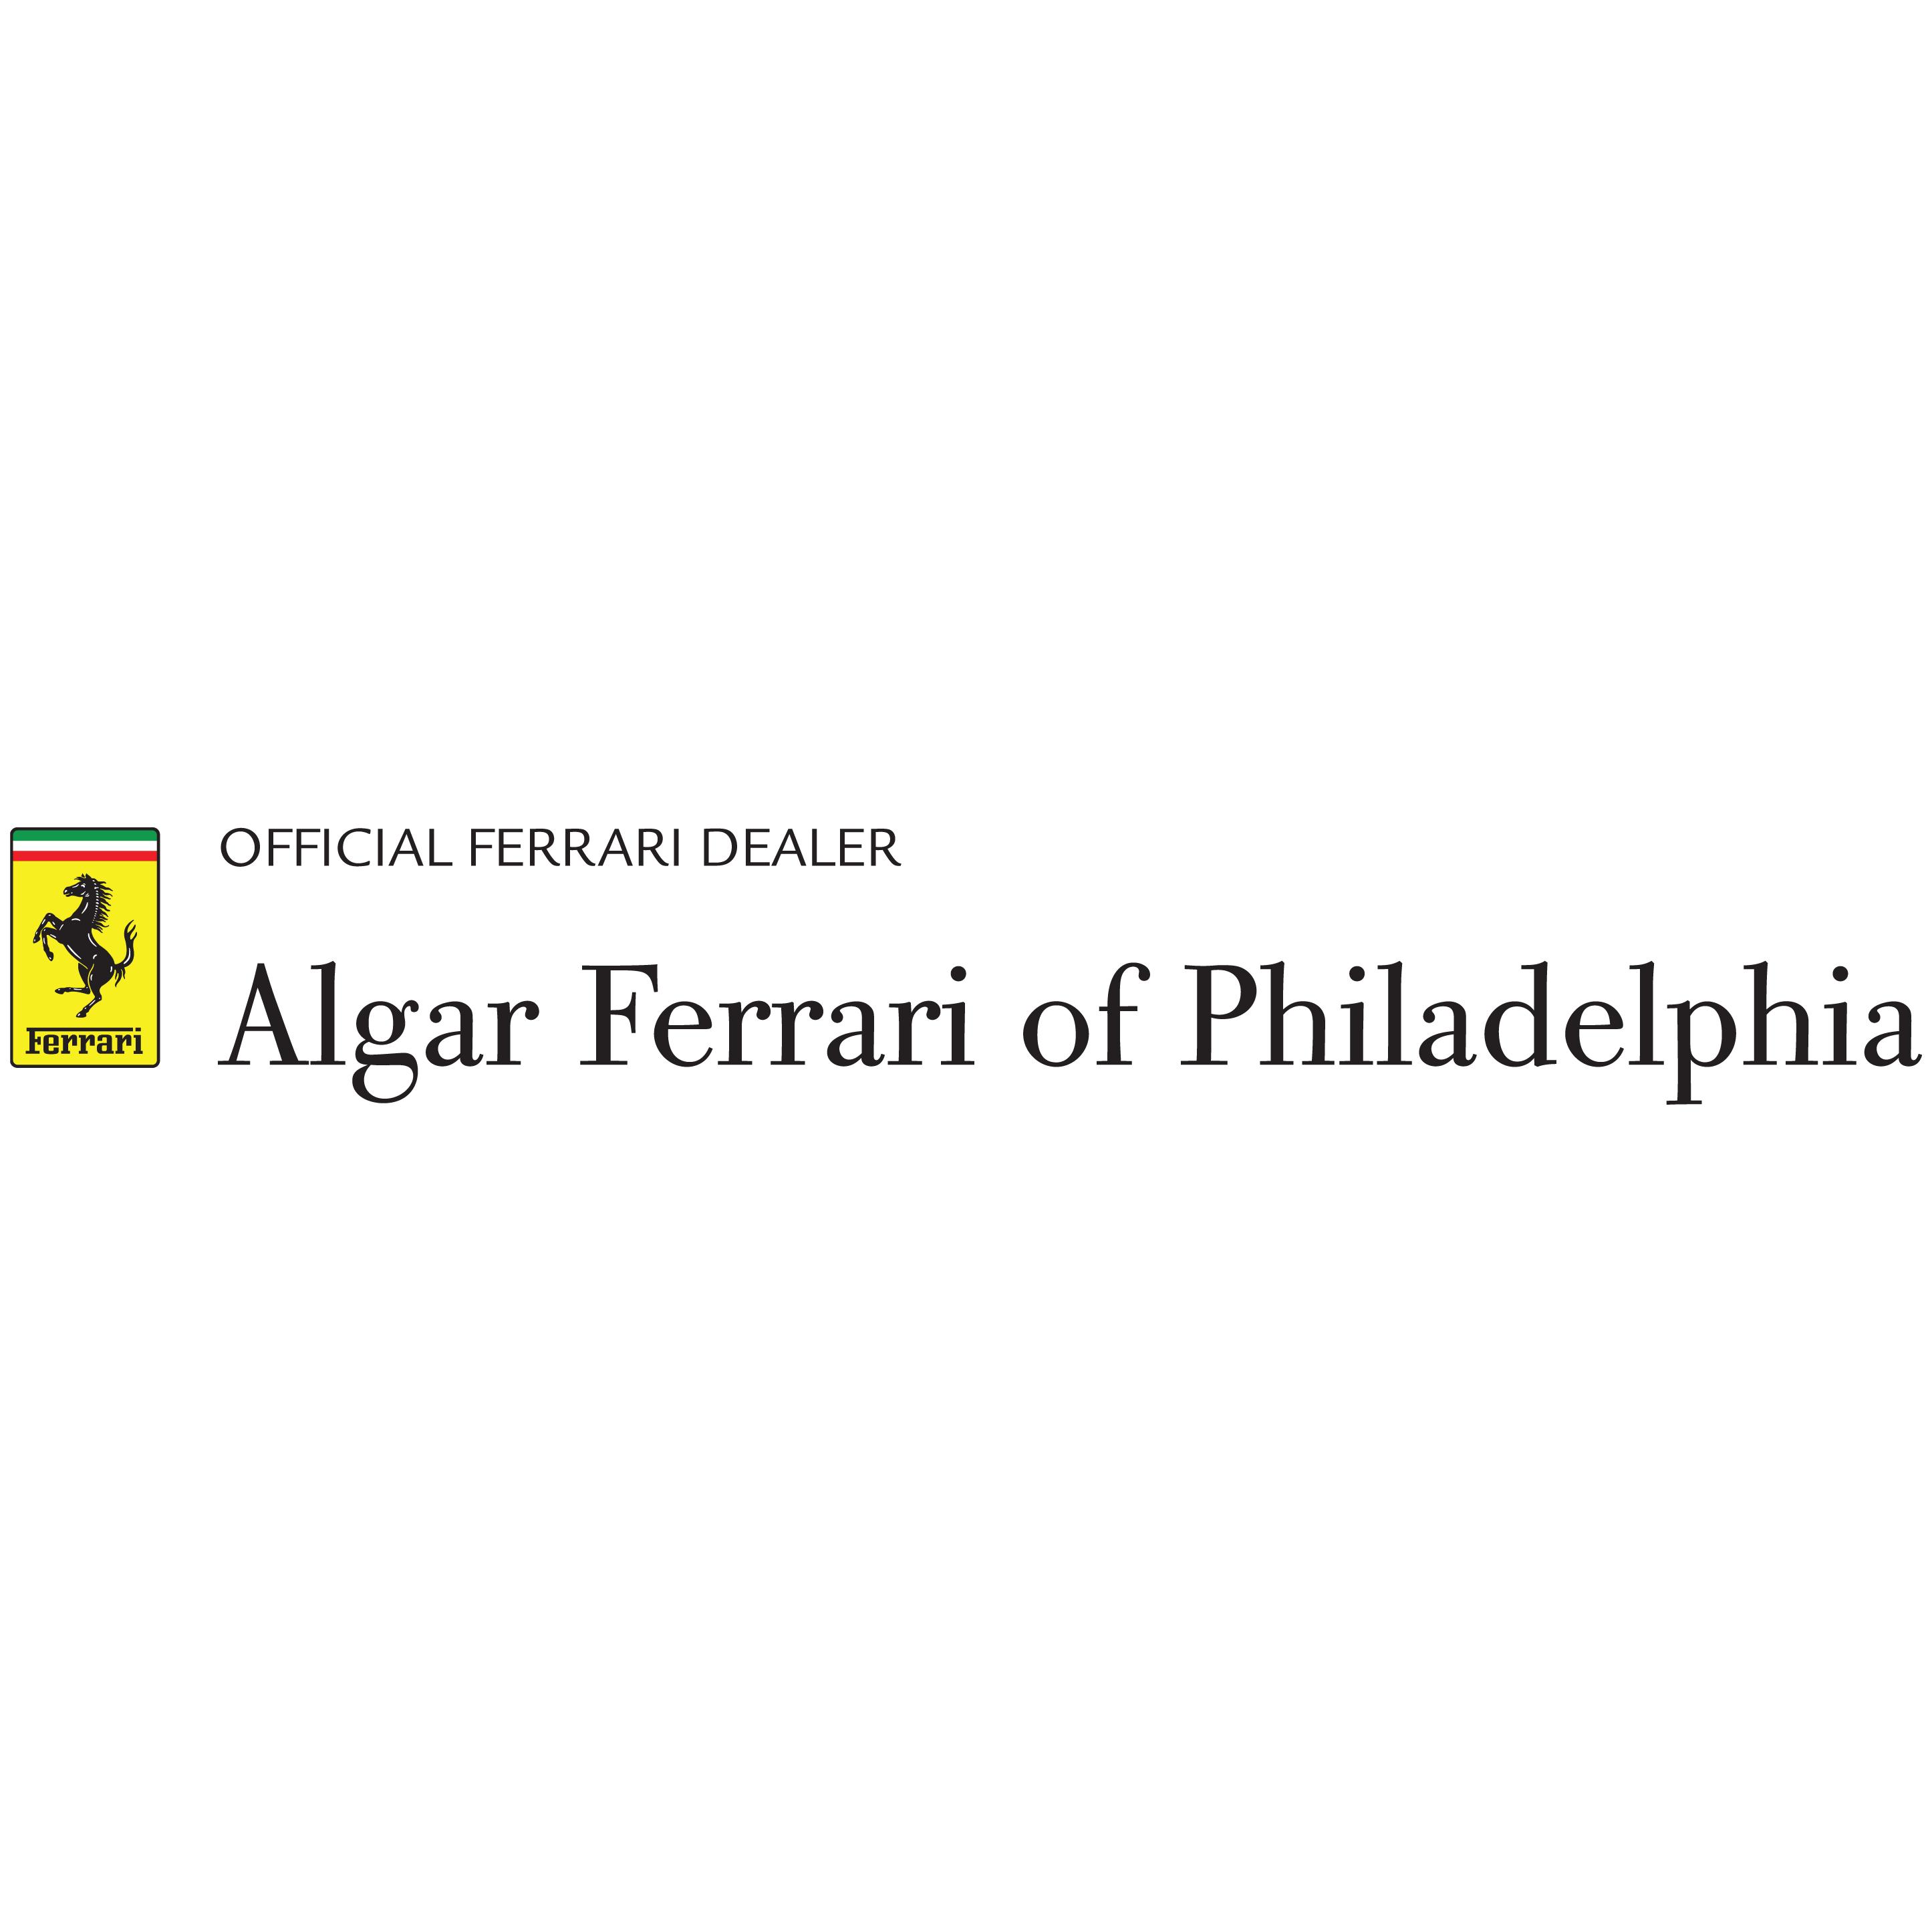 Pennsylvania S Exclusive Authorized Ferrari Dealer